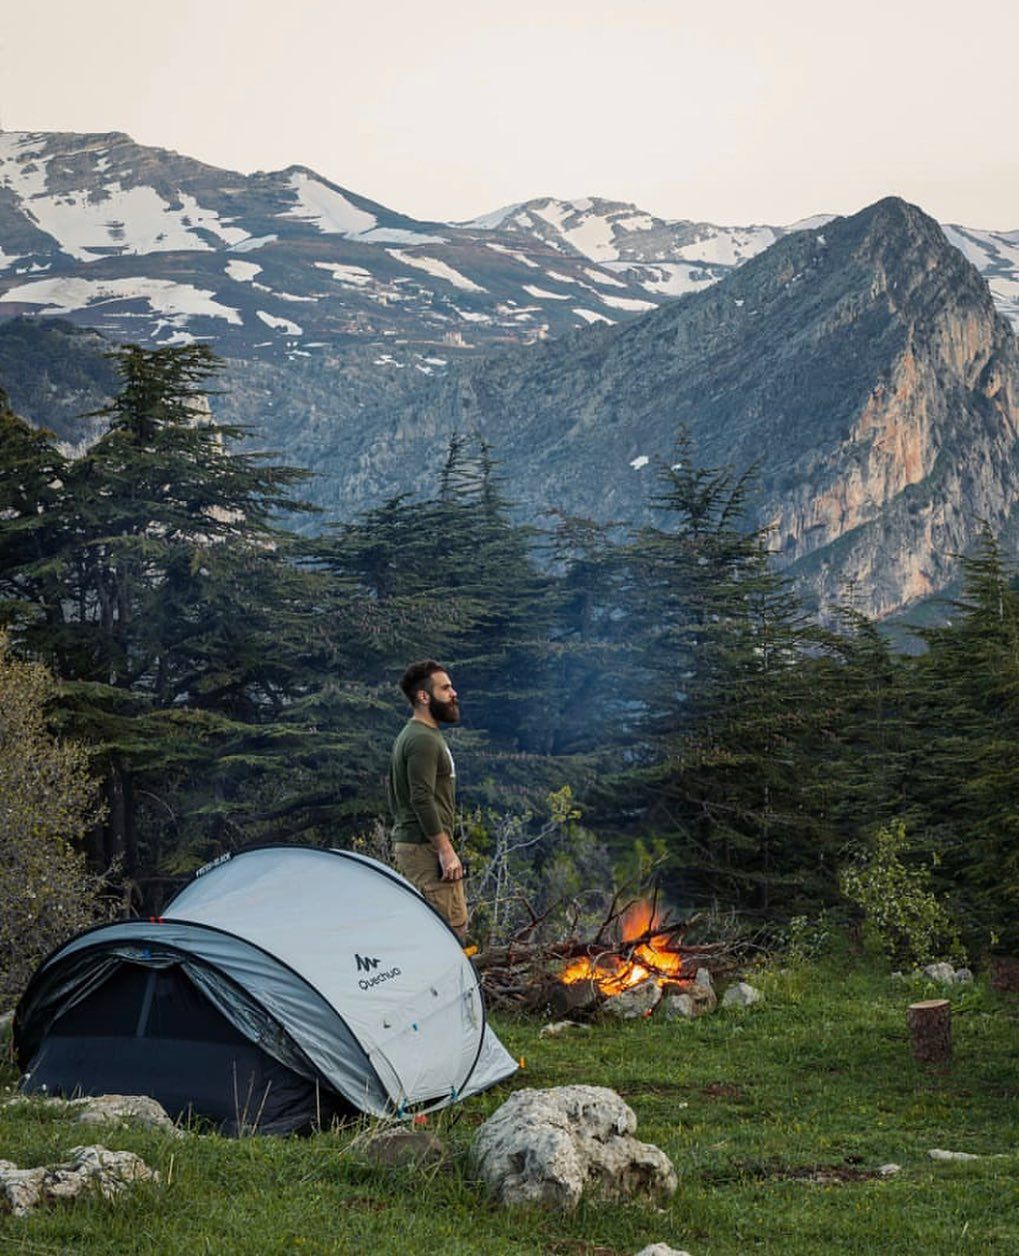 Decathlon En 2020 Decathlon Camping Nature Camping Sauvage